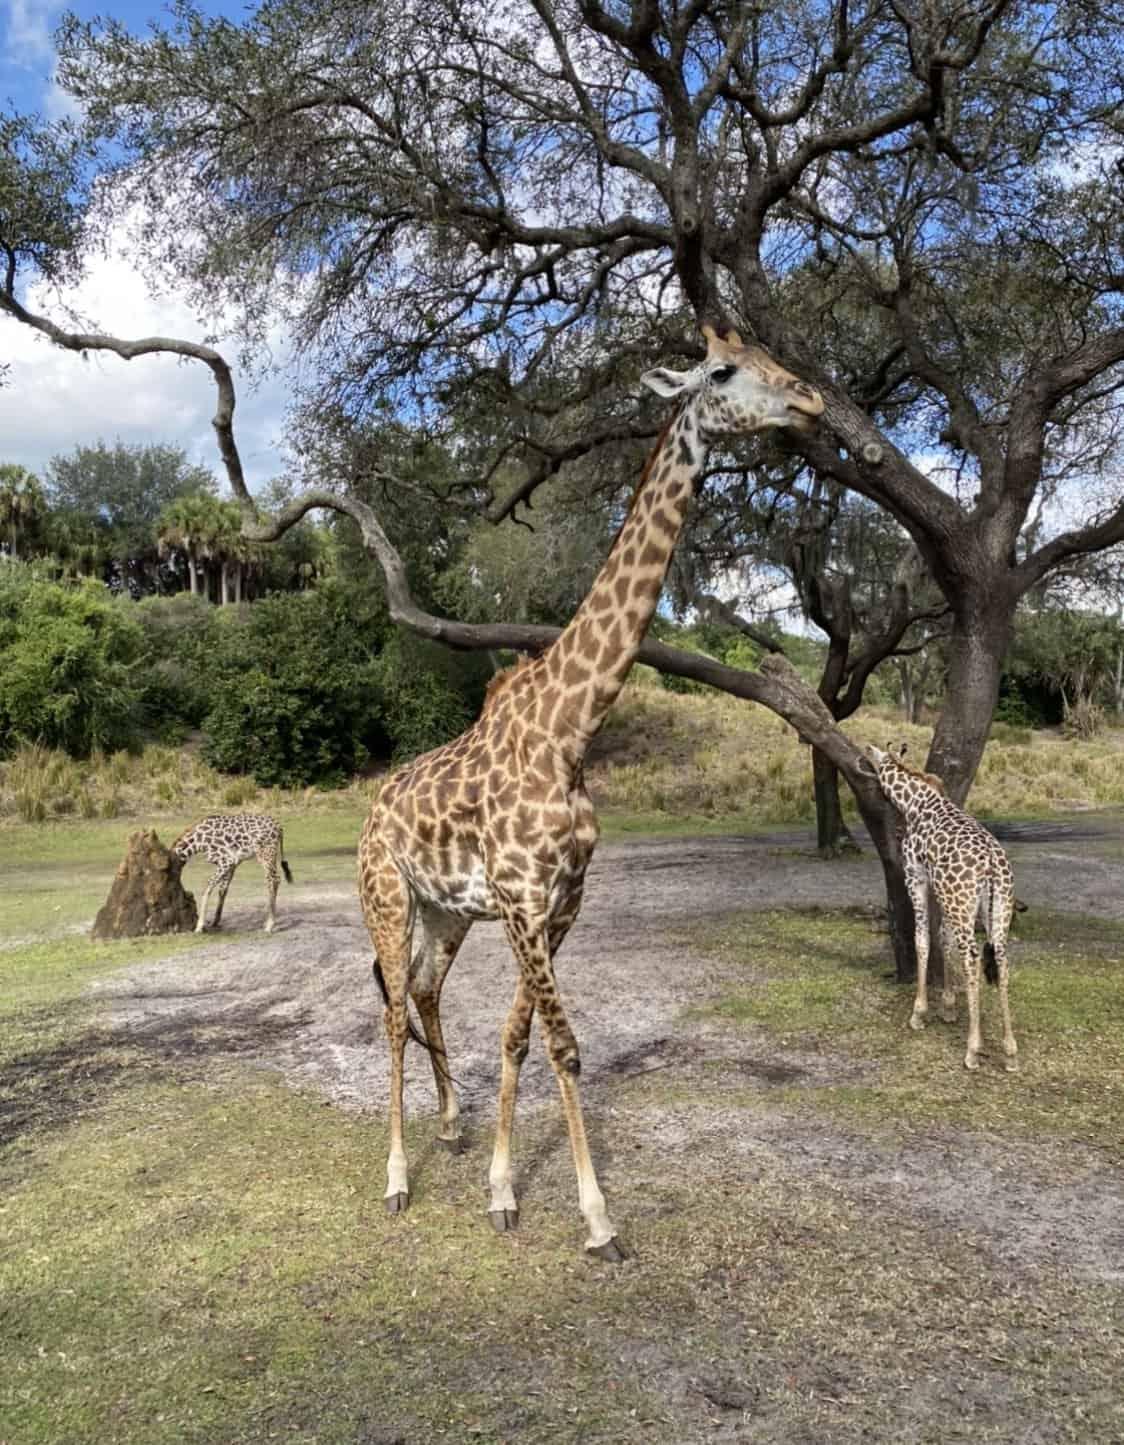 two giraffes under a tree